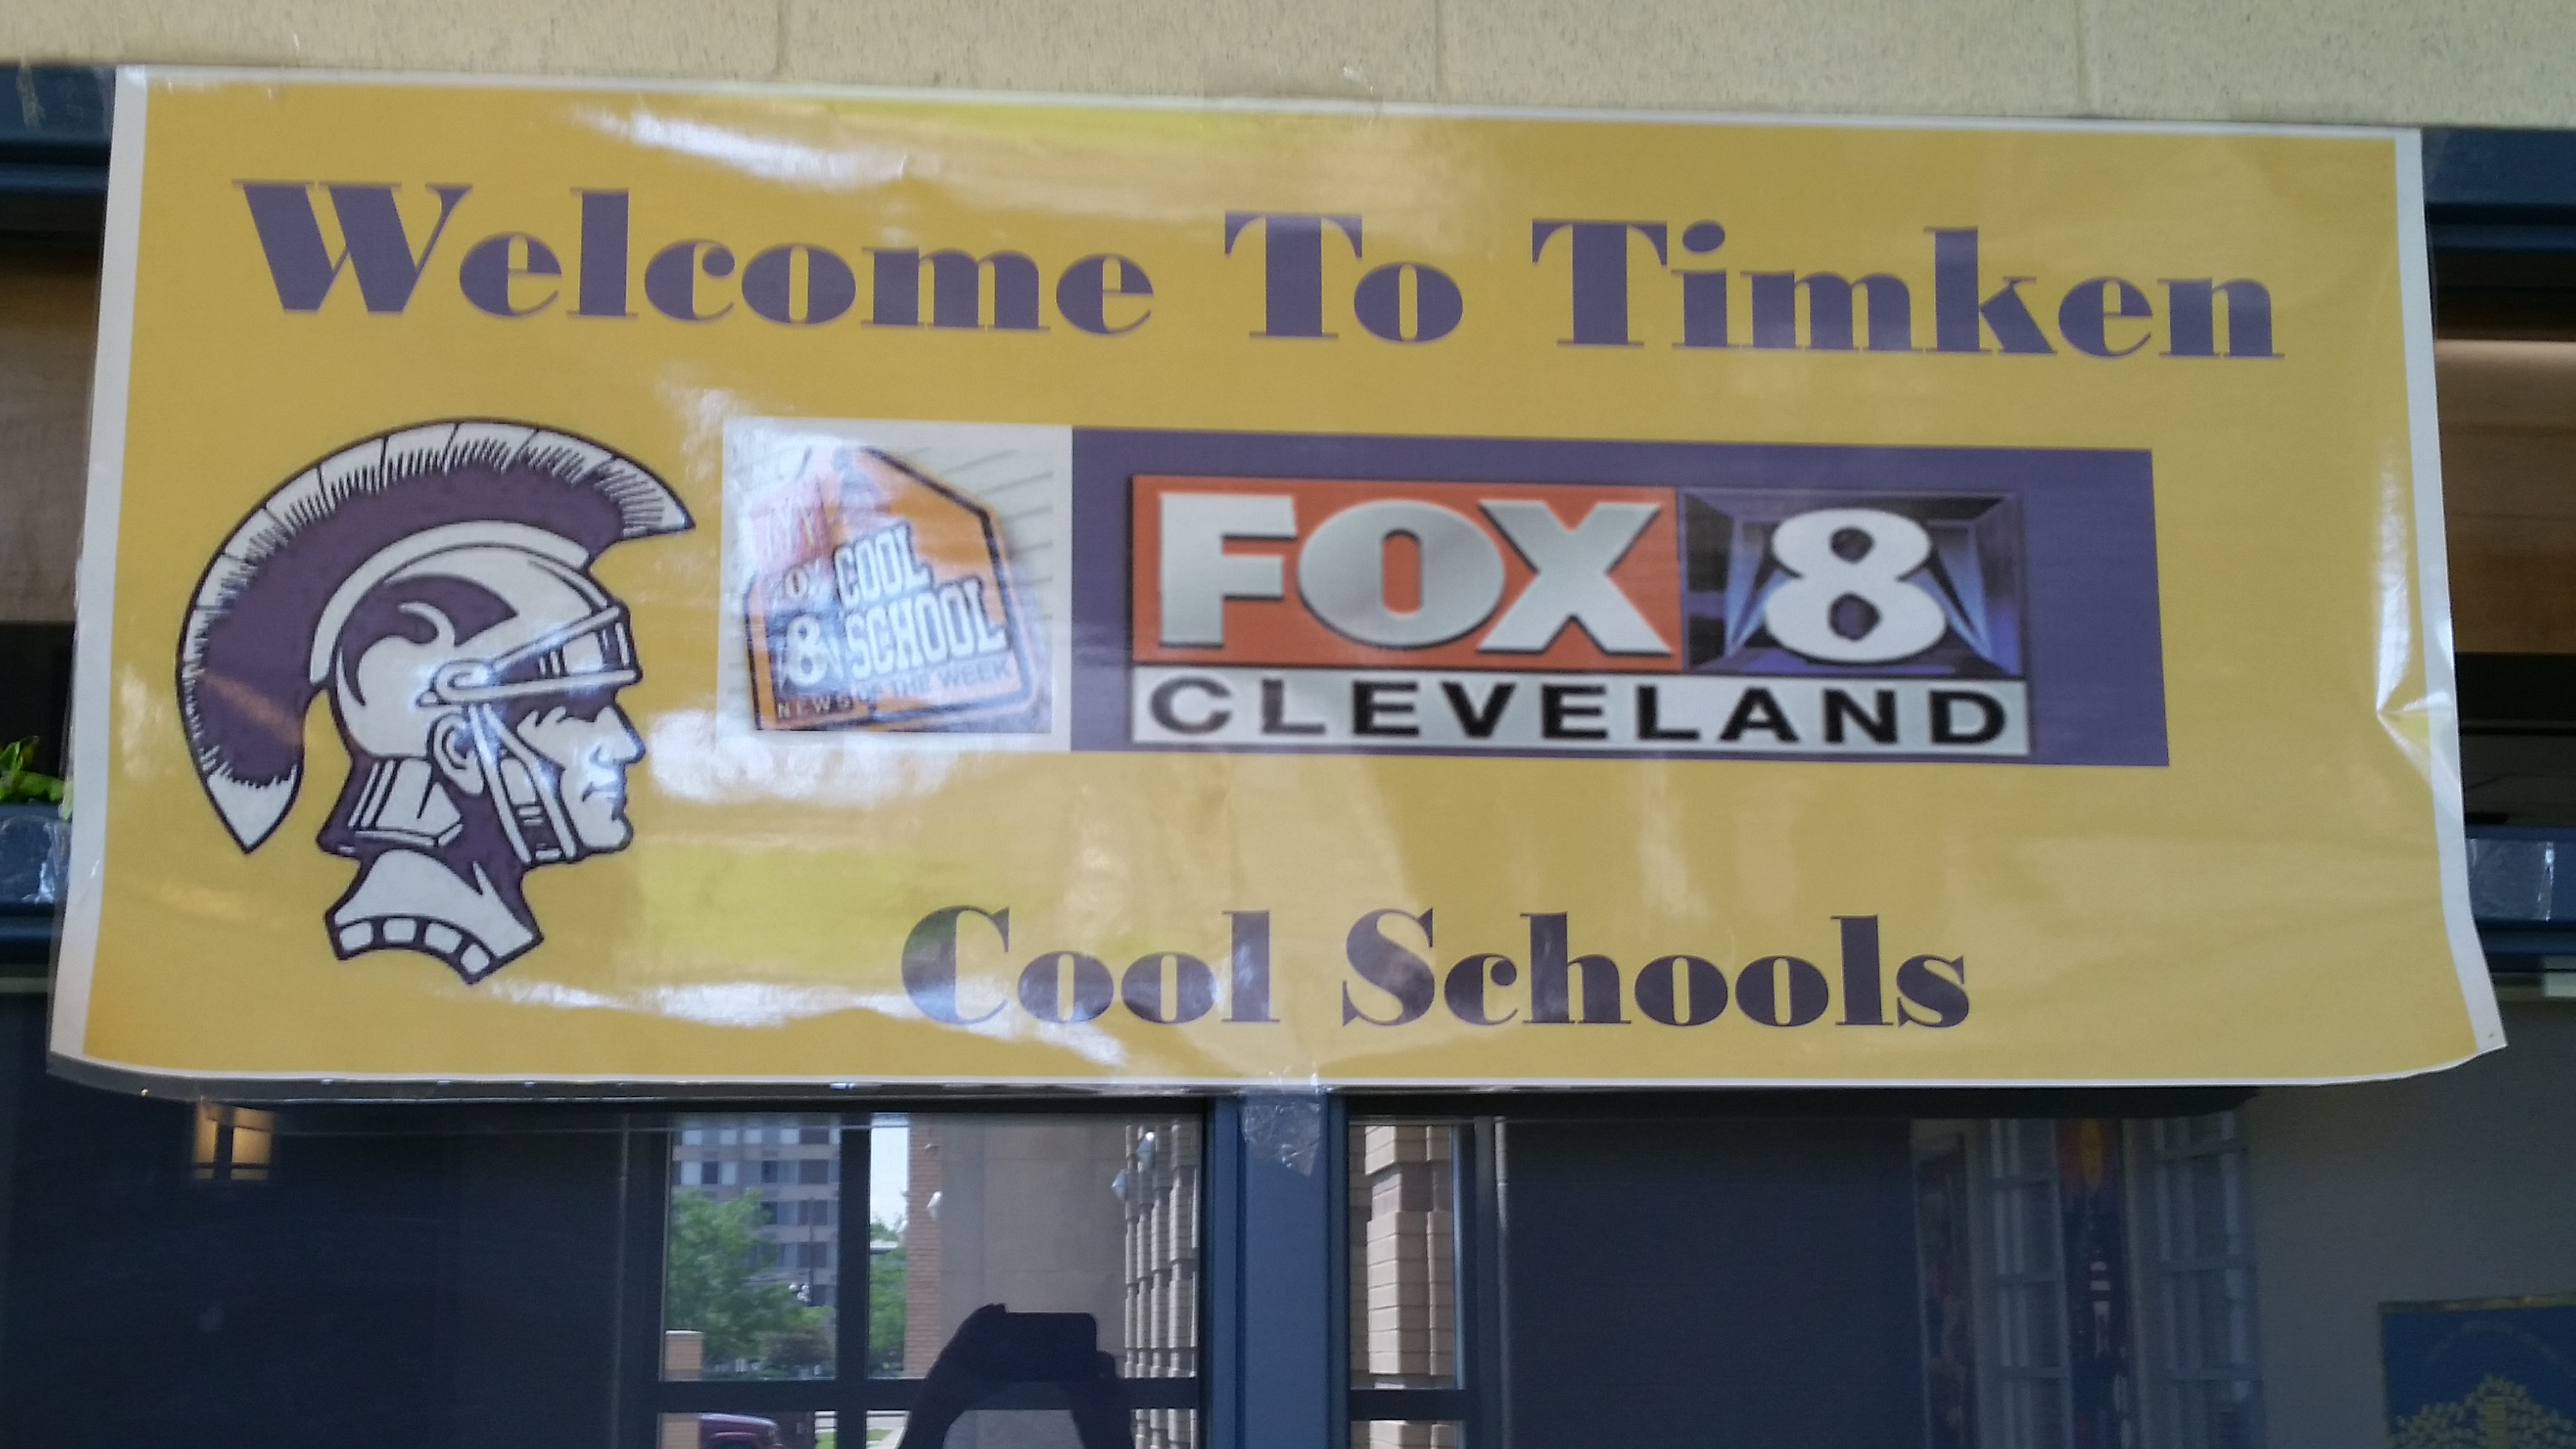 Timken is a Cool School